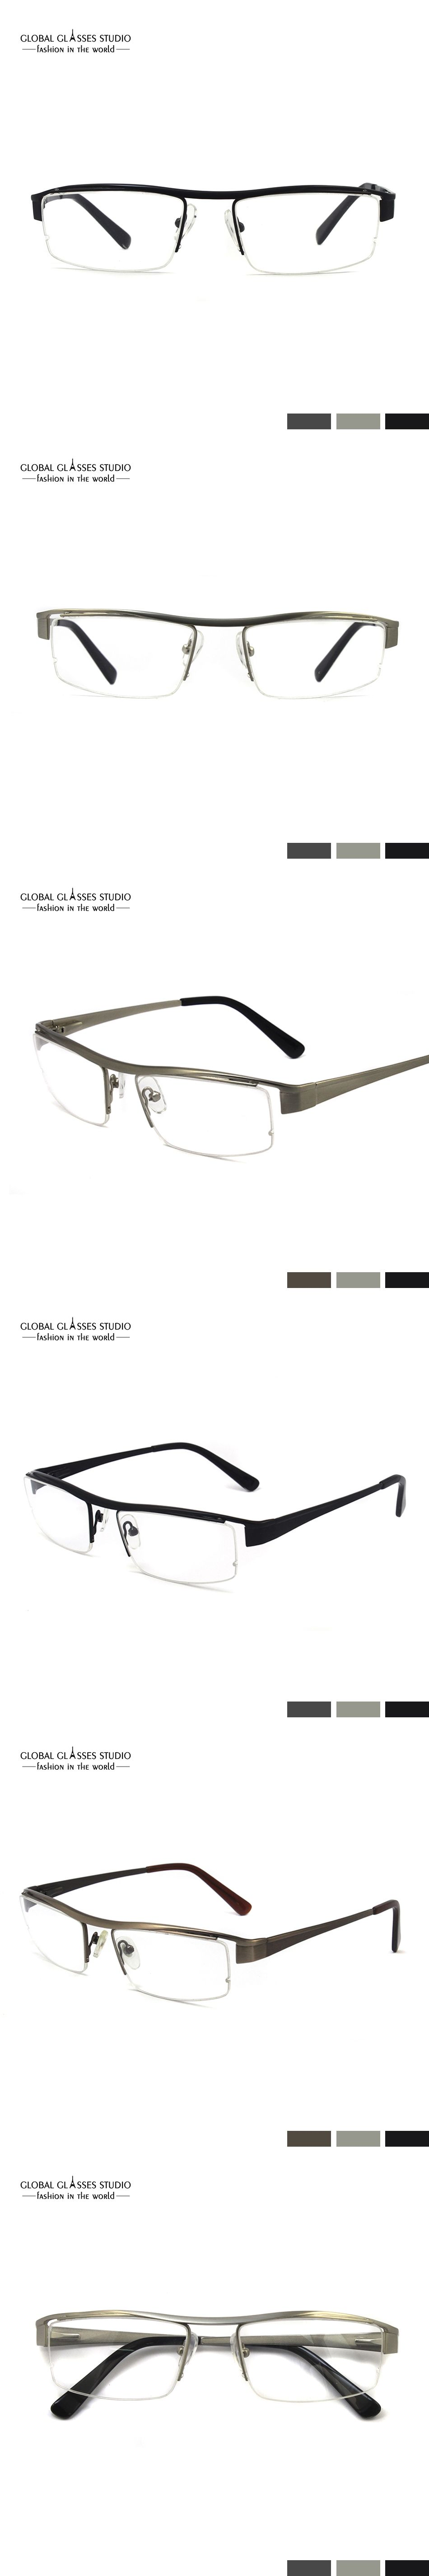 New Fashion Men Simple Frame Glasses design Metal Stainless Steel ...